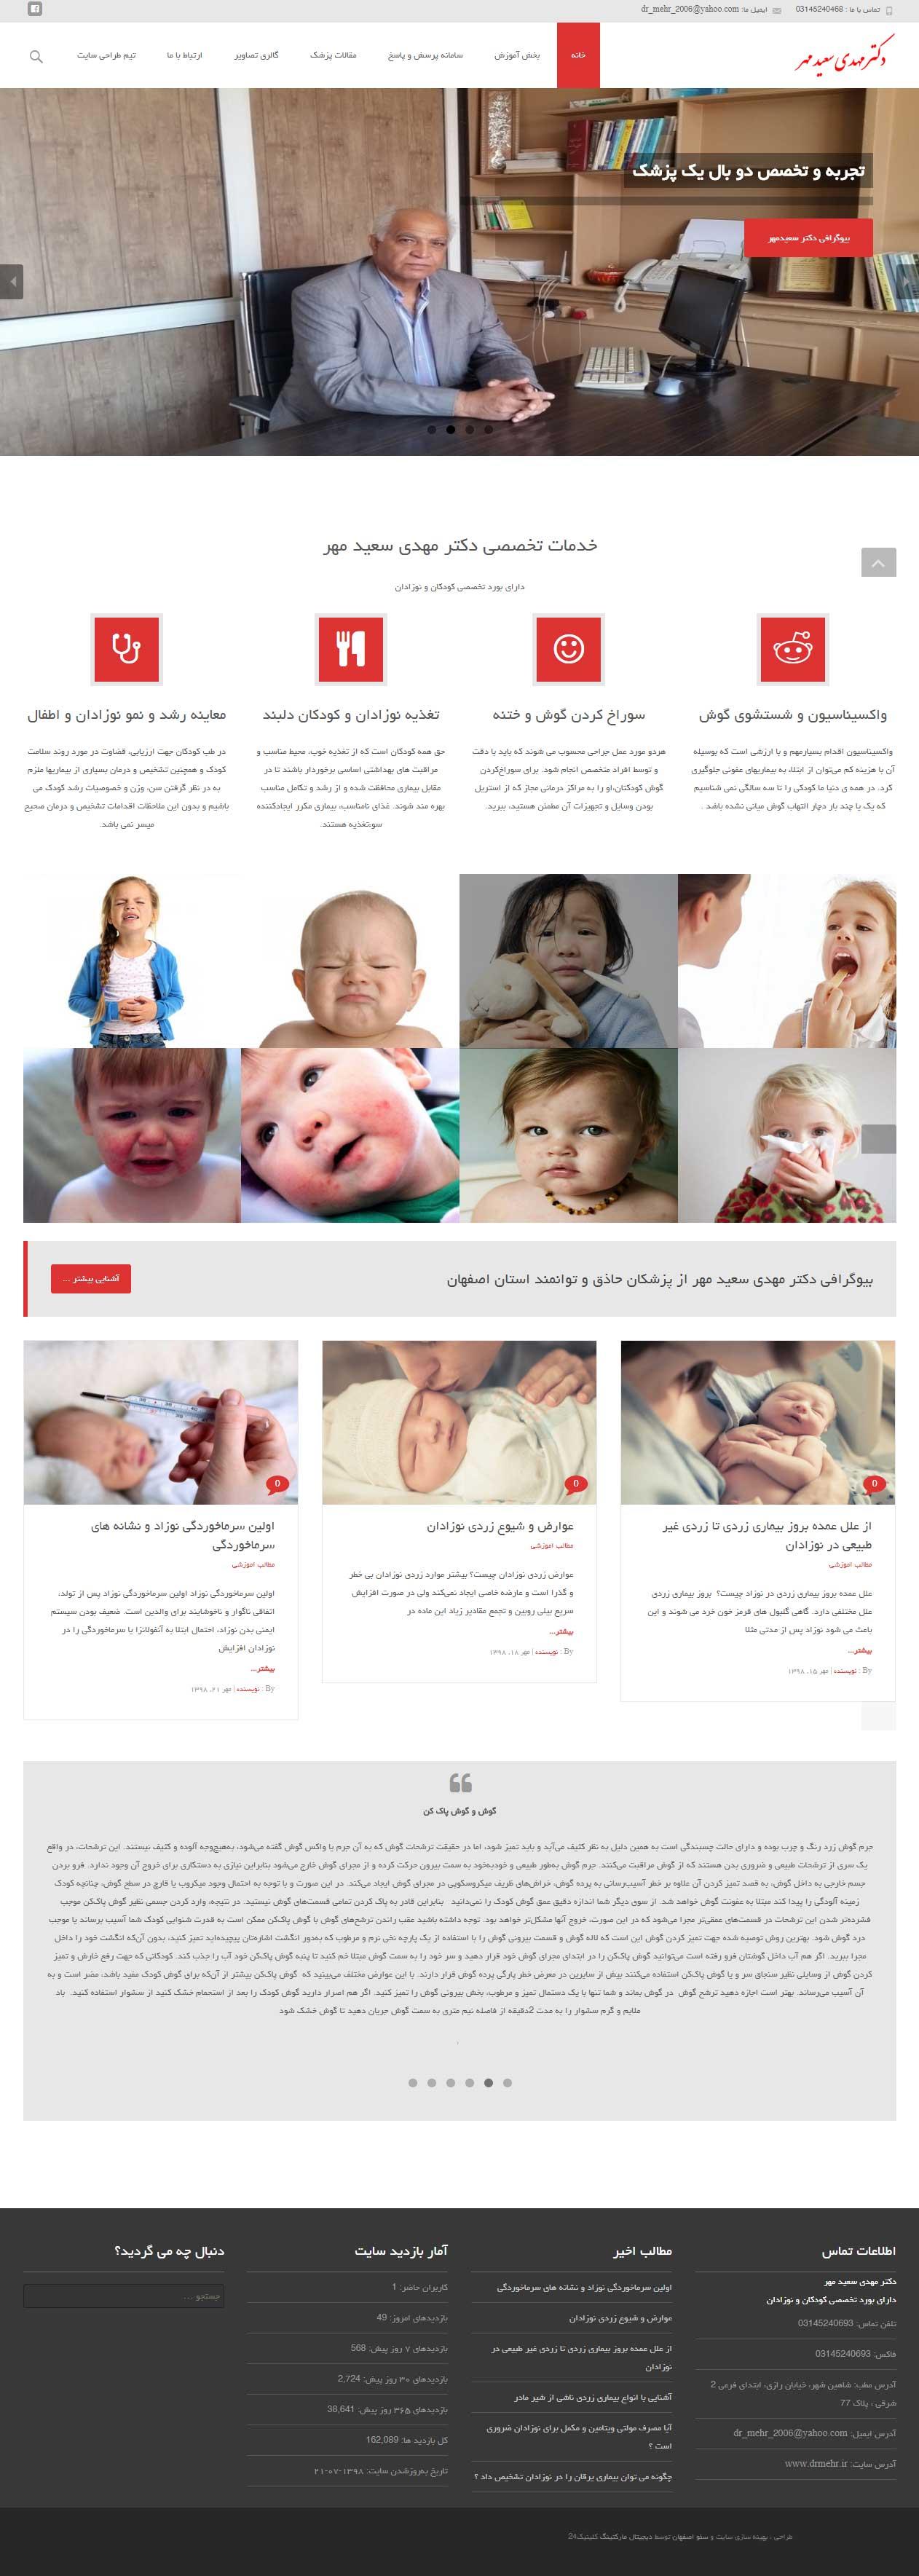 طراحی سایت متخصص کودکان و نوزادان